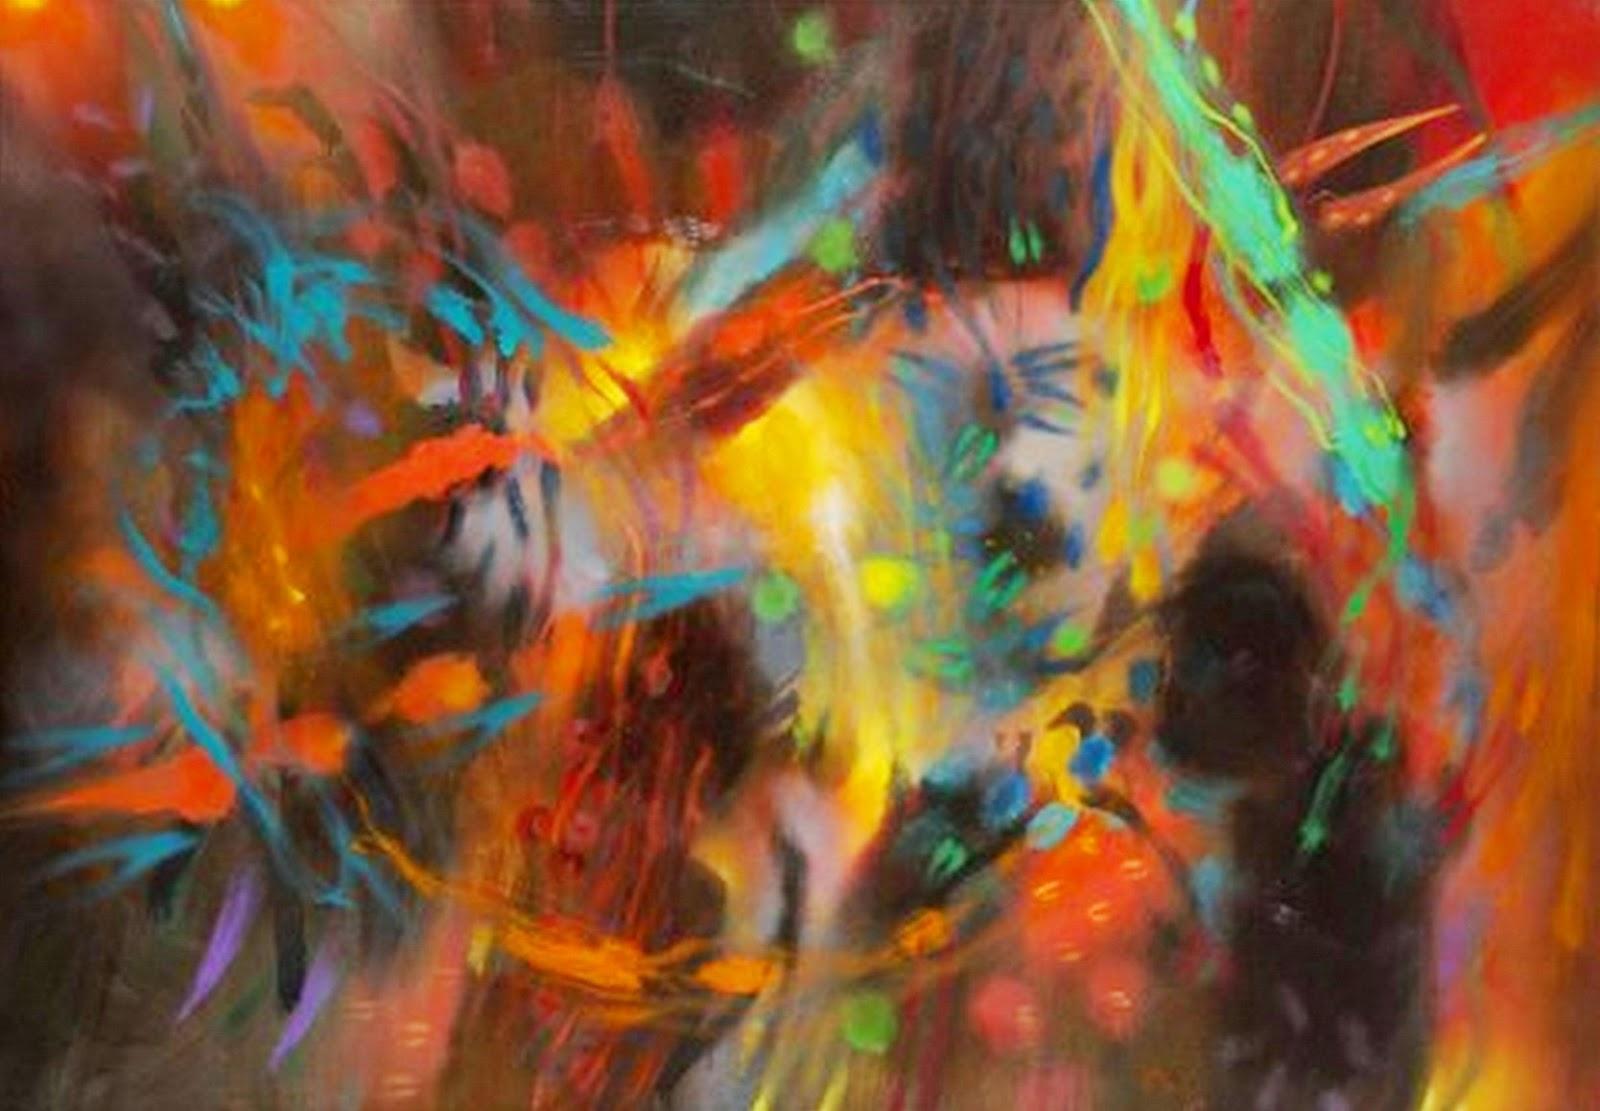 Pintura moderna y fotograf a art stica exposicion for Imagenes de cuadros abstractos modernos para imprimir